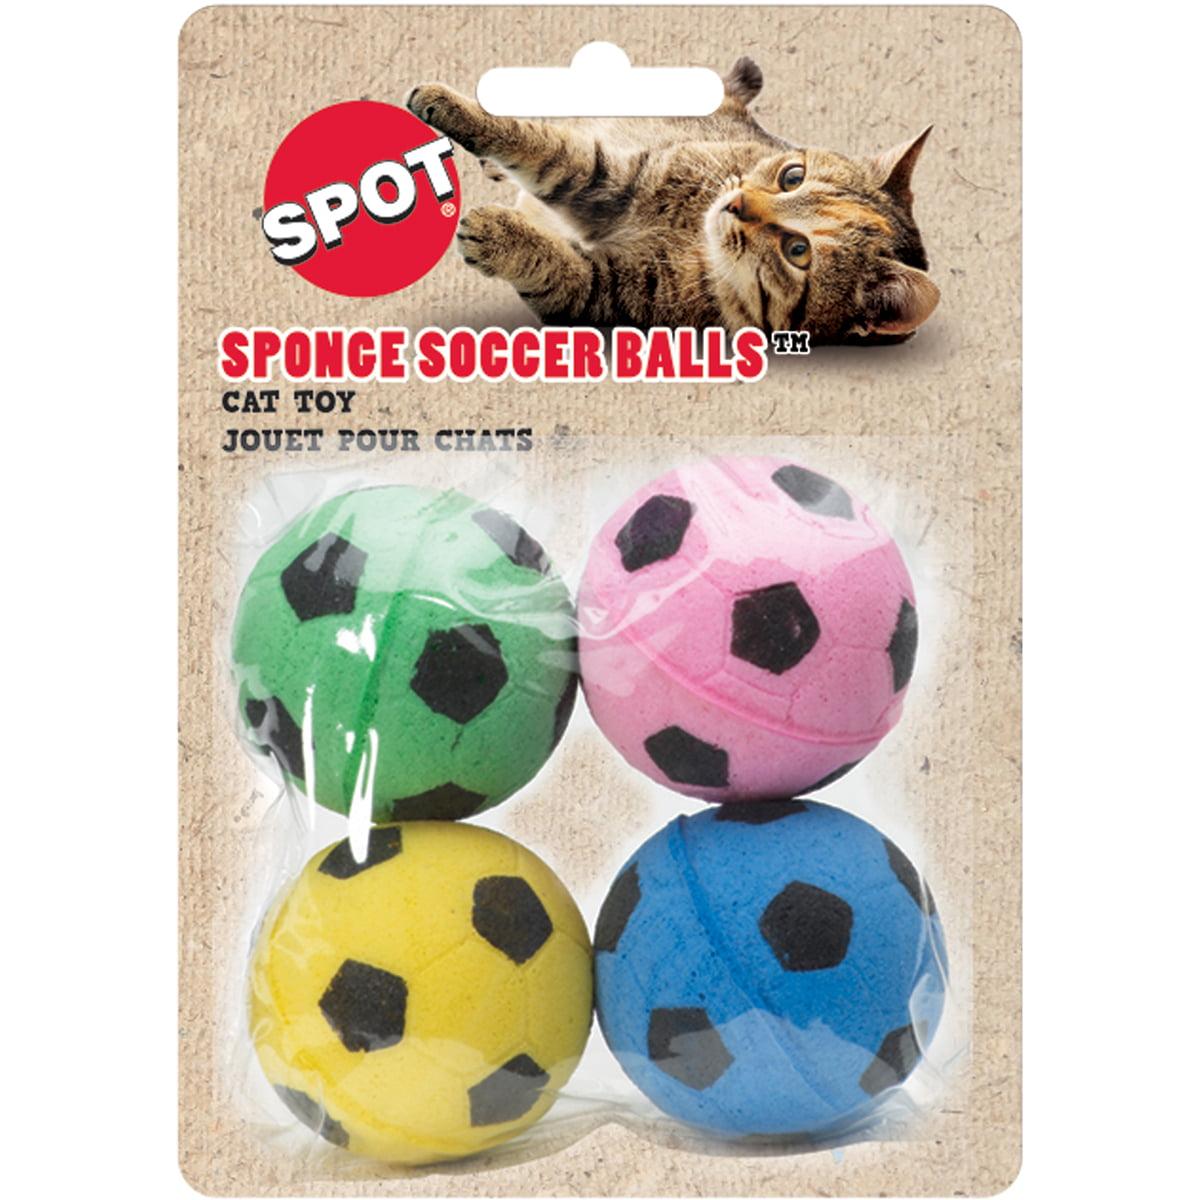 "Sponge Soccer Balls 1.5"" 4/Pkg-Assorted - image 1 of 1"